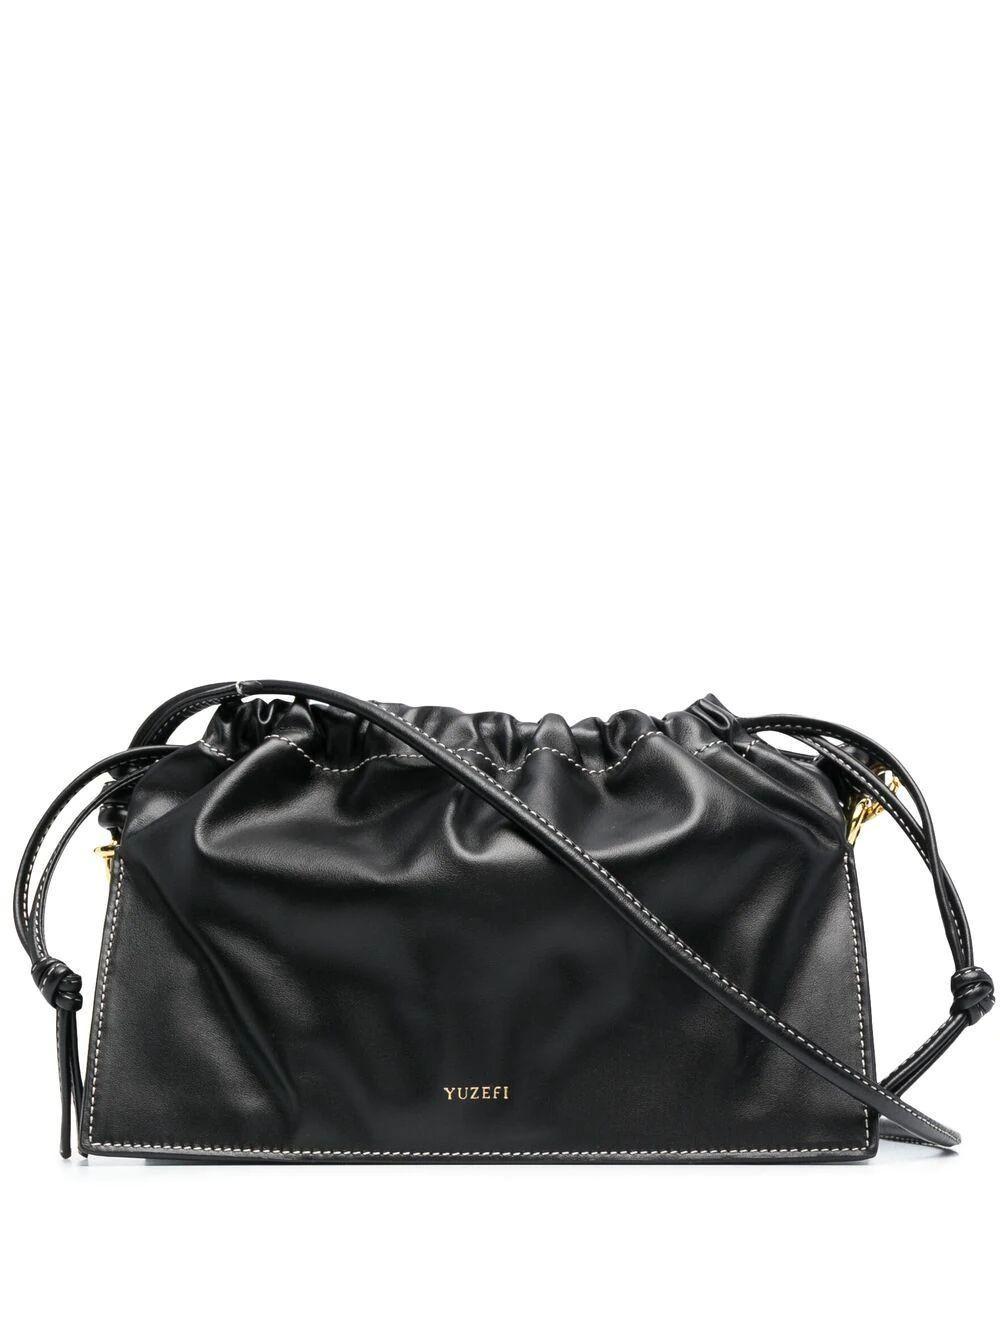 Bom Bag With Chain Handle Item # YUZCO-HB-BO-00